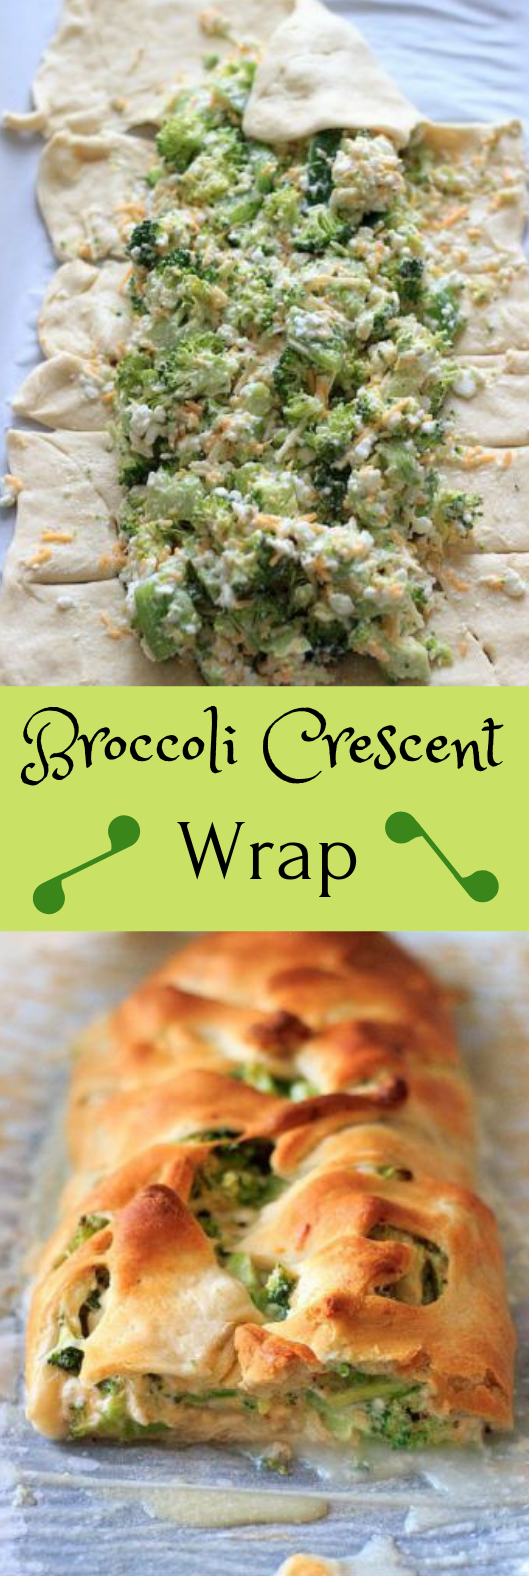 Broccoli crescent wrap #vegetarian #broccoli